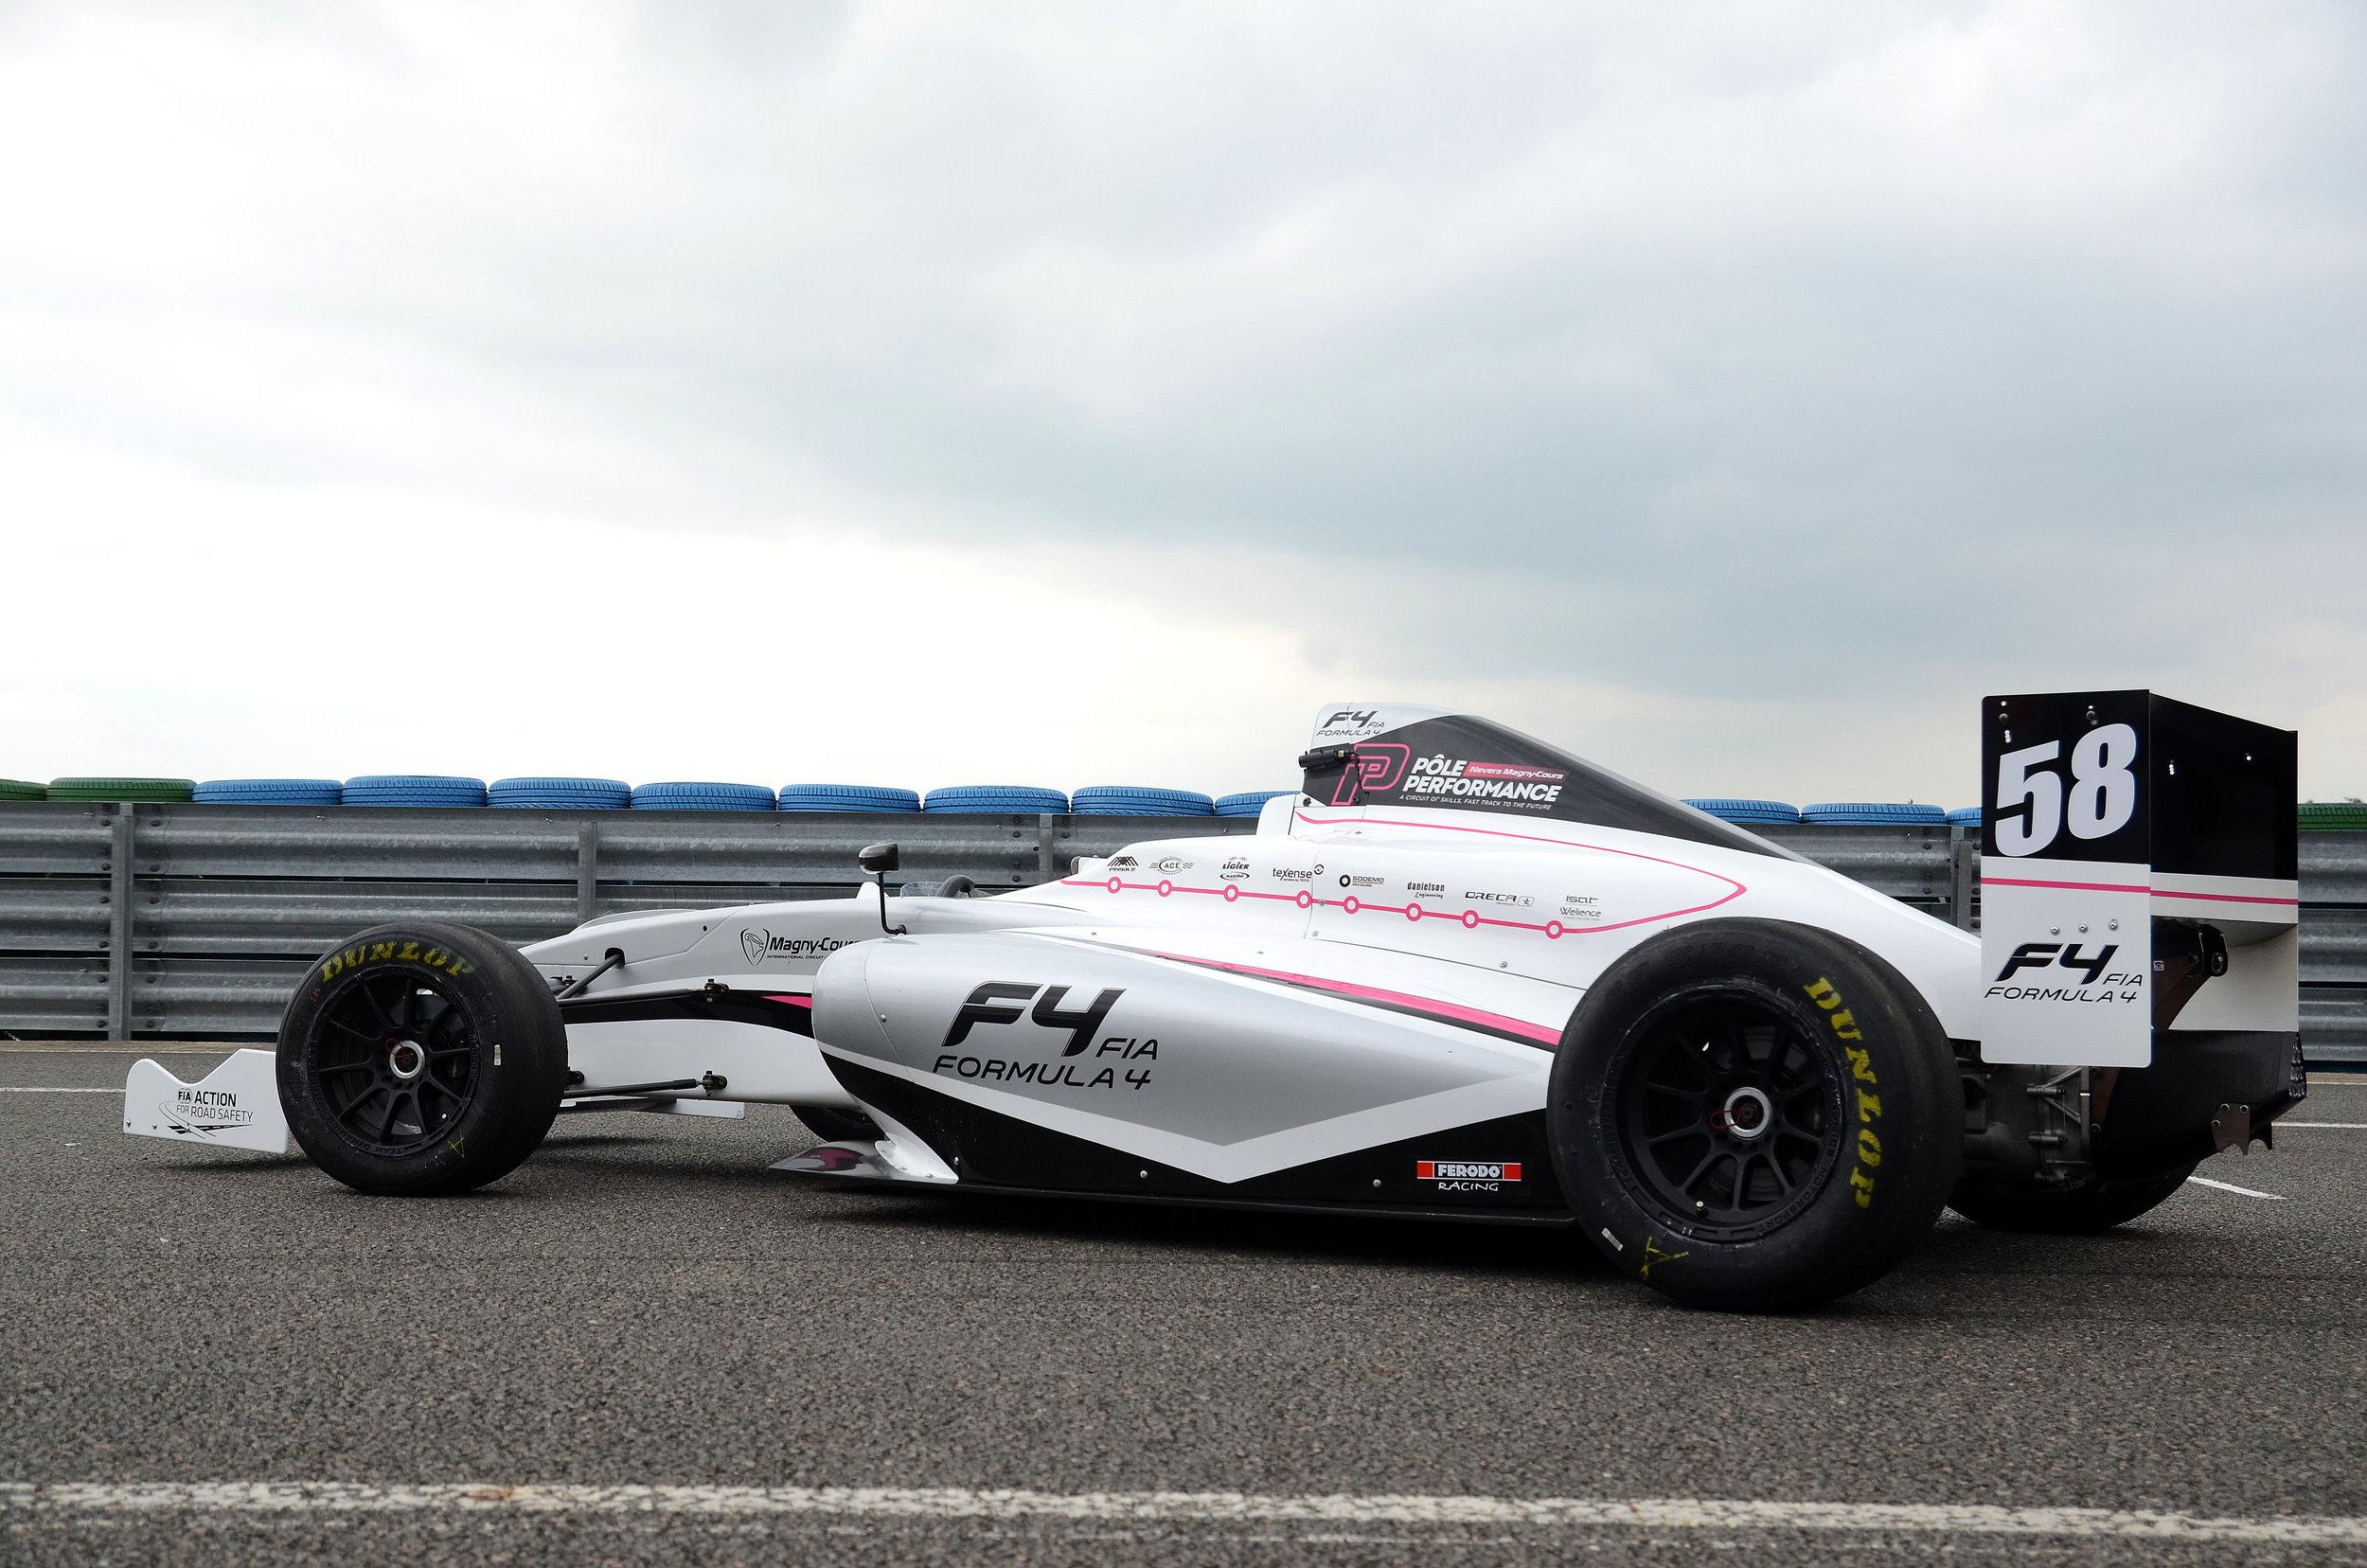 Formula 4 single seater with Ferodo Racing brake pads